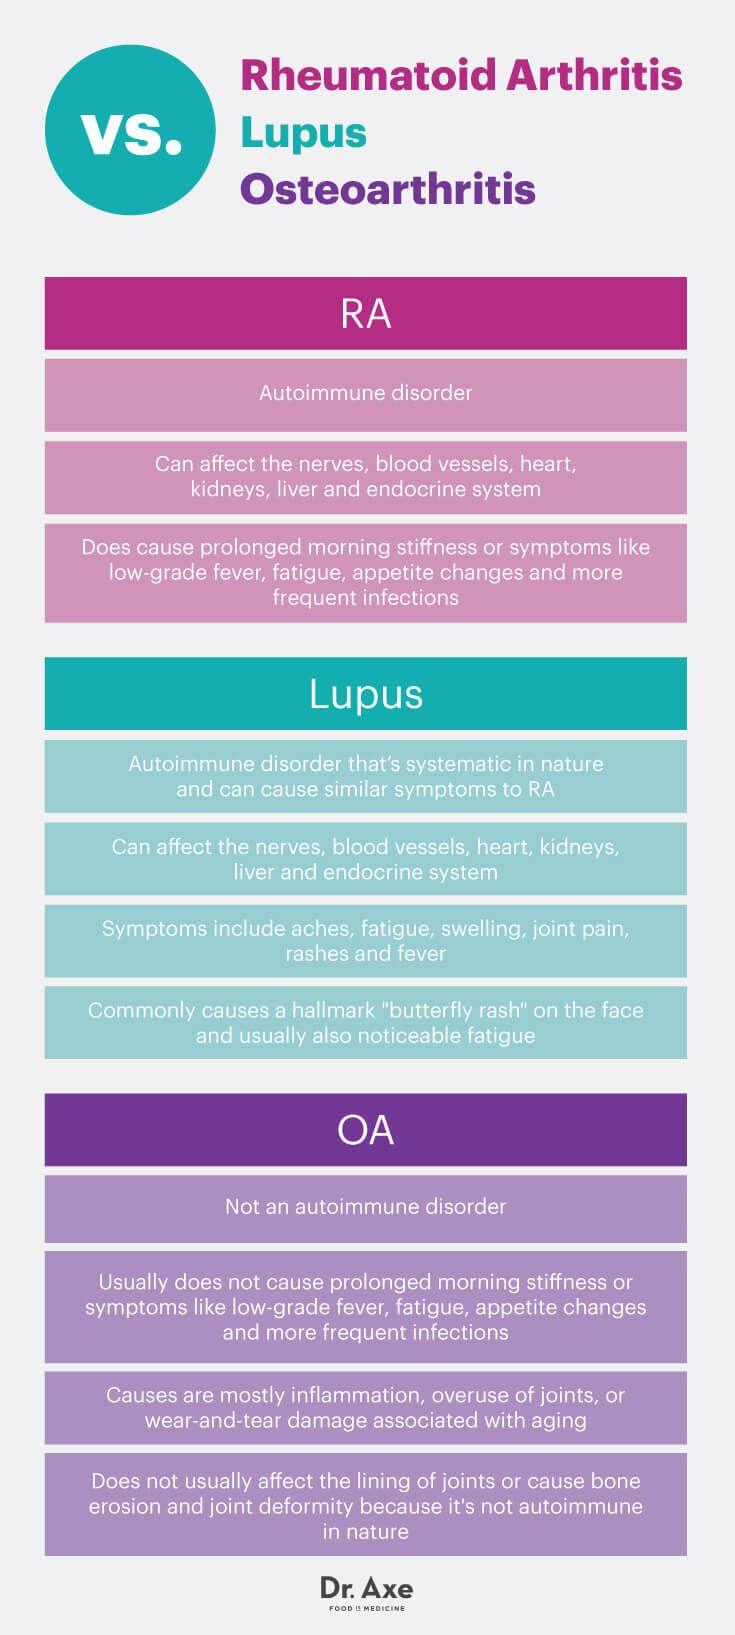 Rheumatoid arthritis vs. lupus vs. osteoarthritis - Dr. Axe http://www.draxe.com #health #holistic #natural